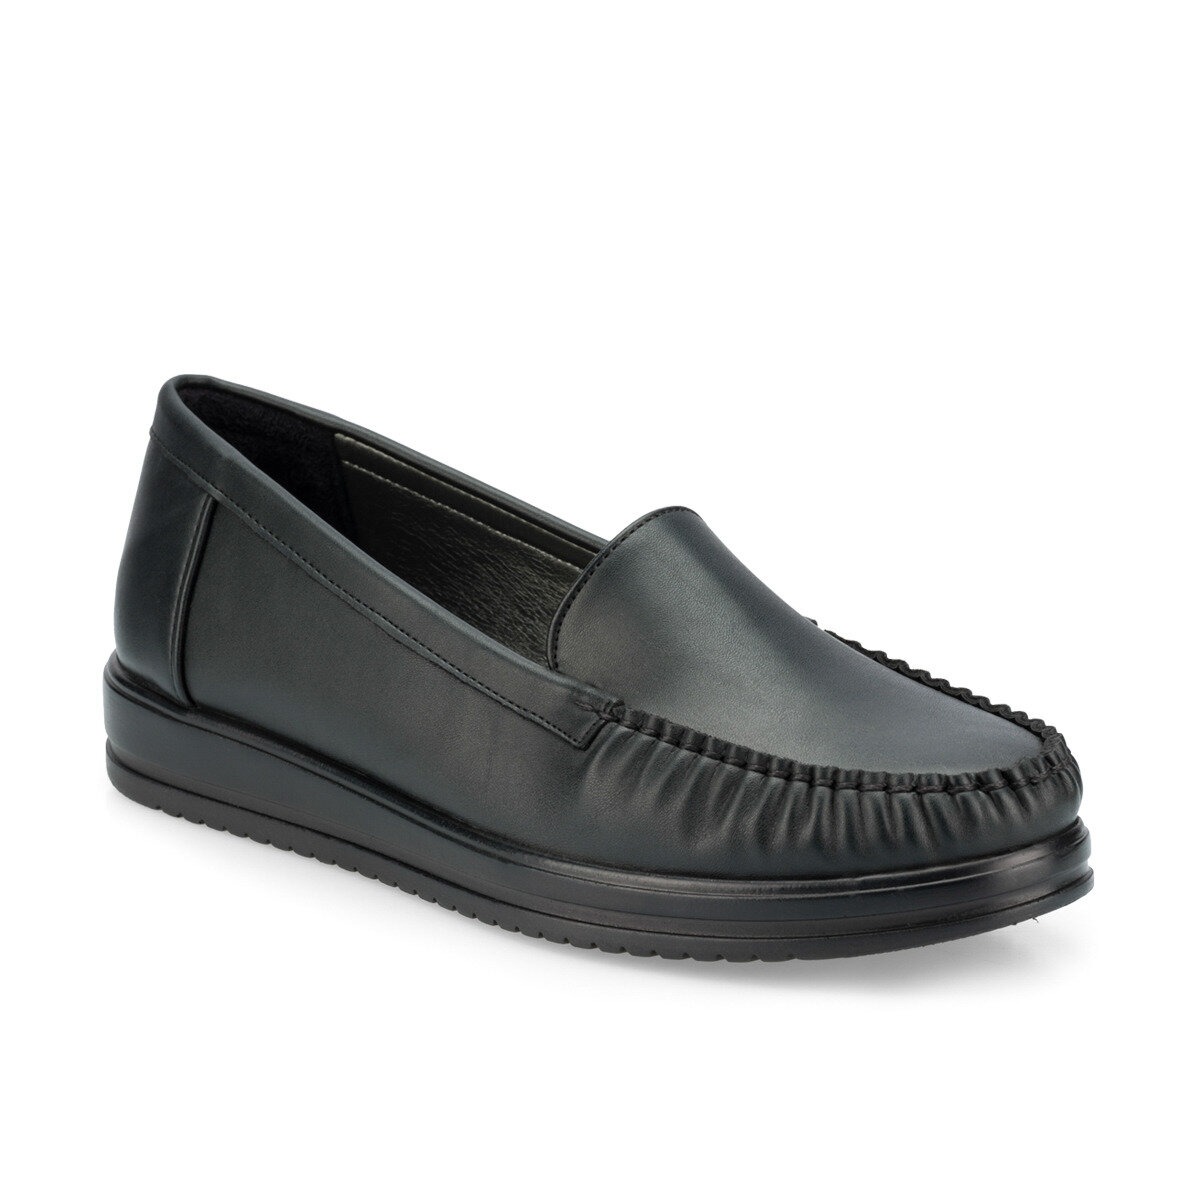 FLO 161237.Z Black Women Shoes Polaris